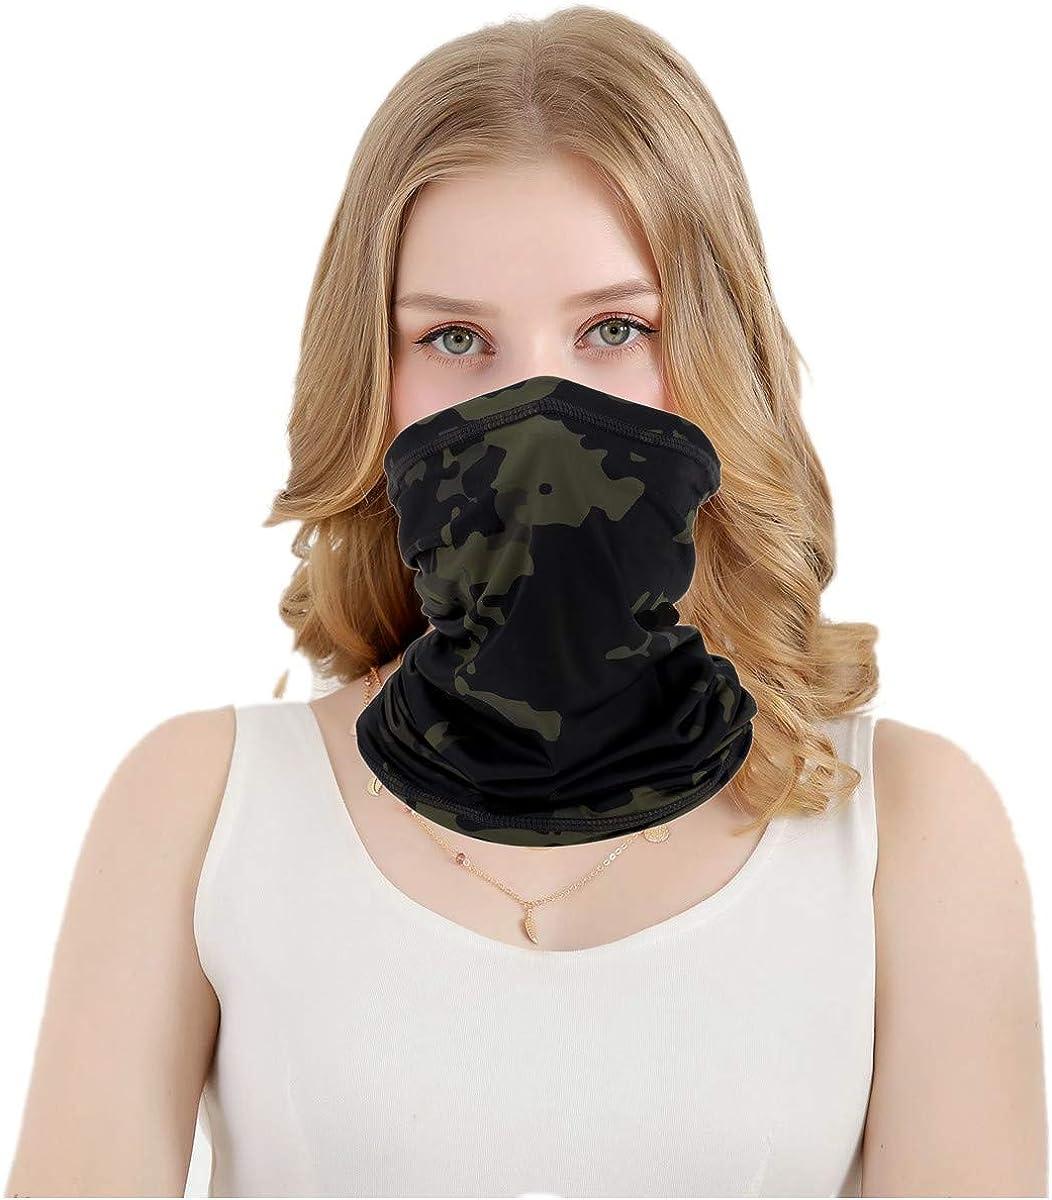 MengPa Kids Face Cover Neck Gaiter Ear Loops Balaclava 2Pcs